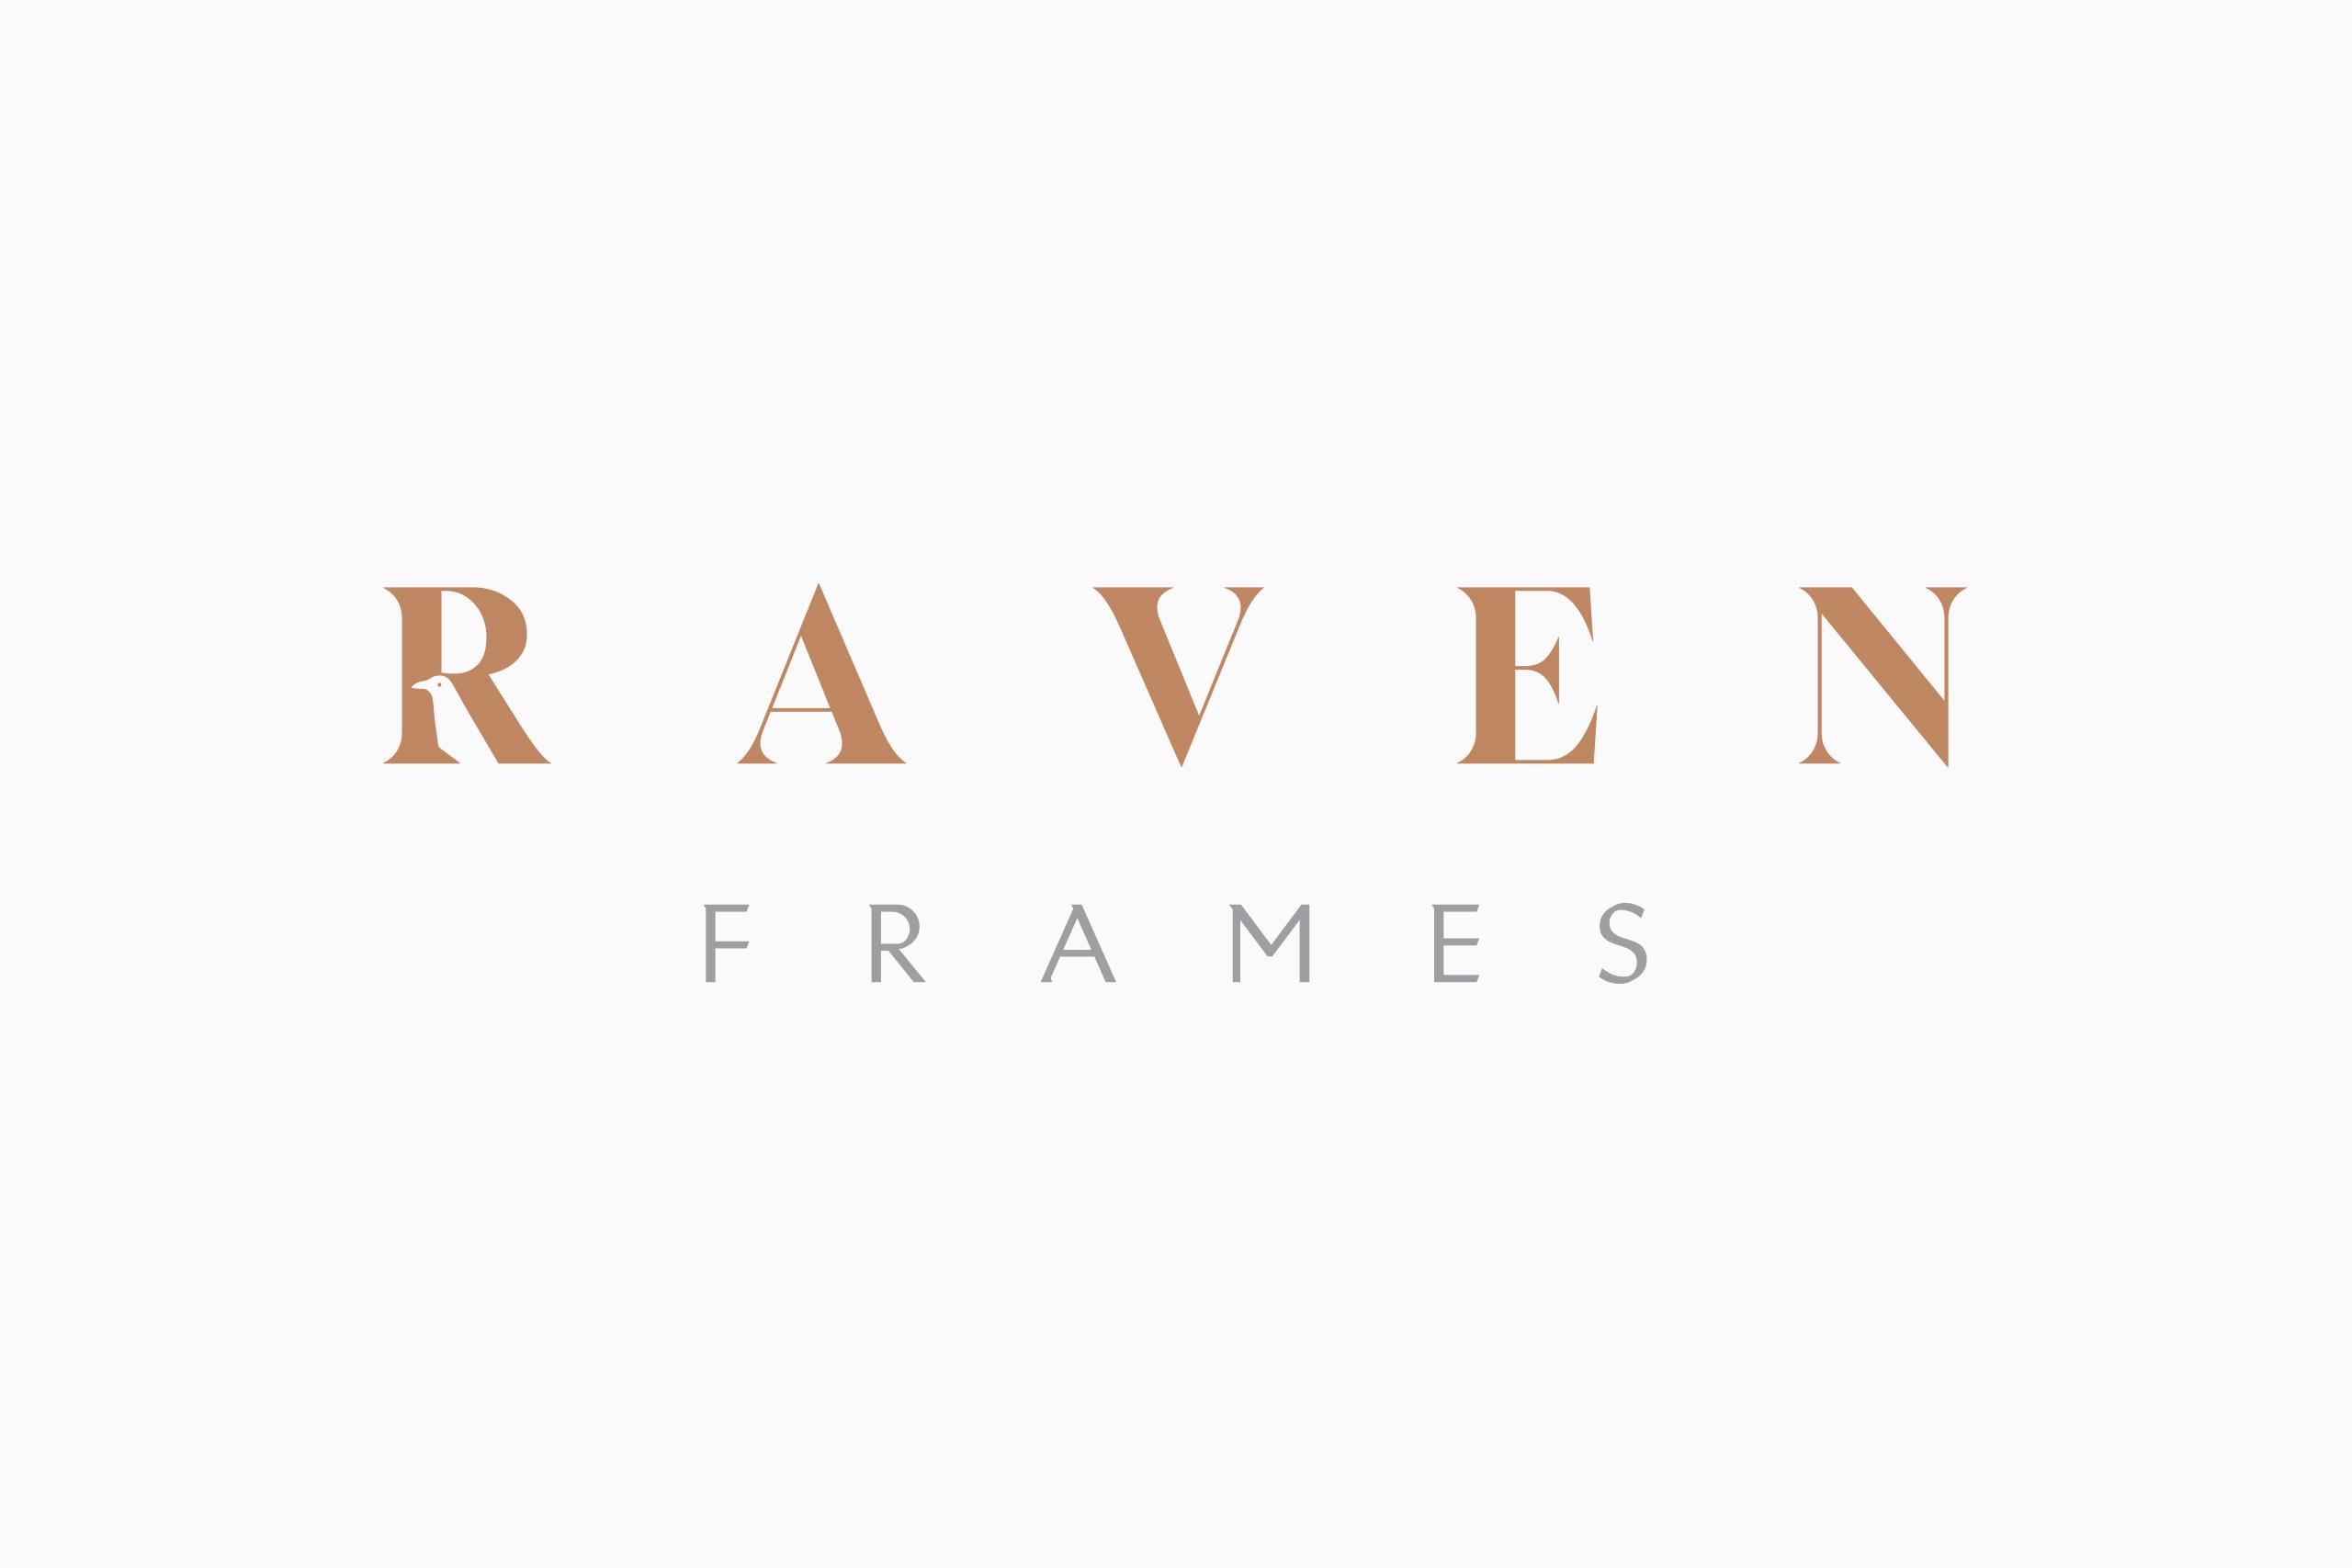 Logo design raven frames